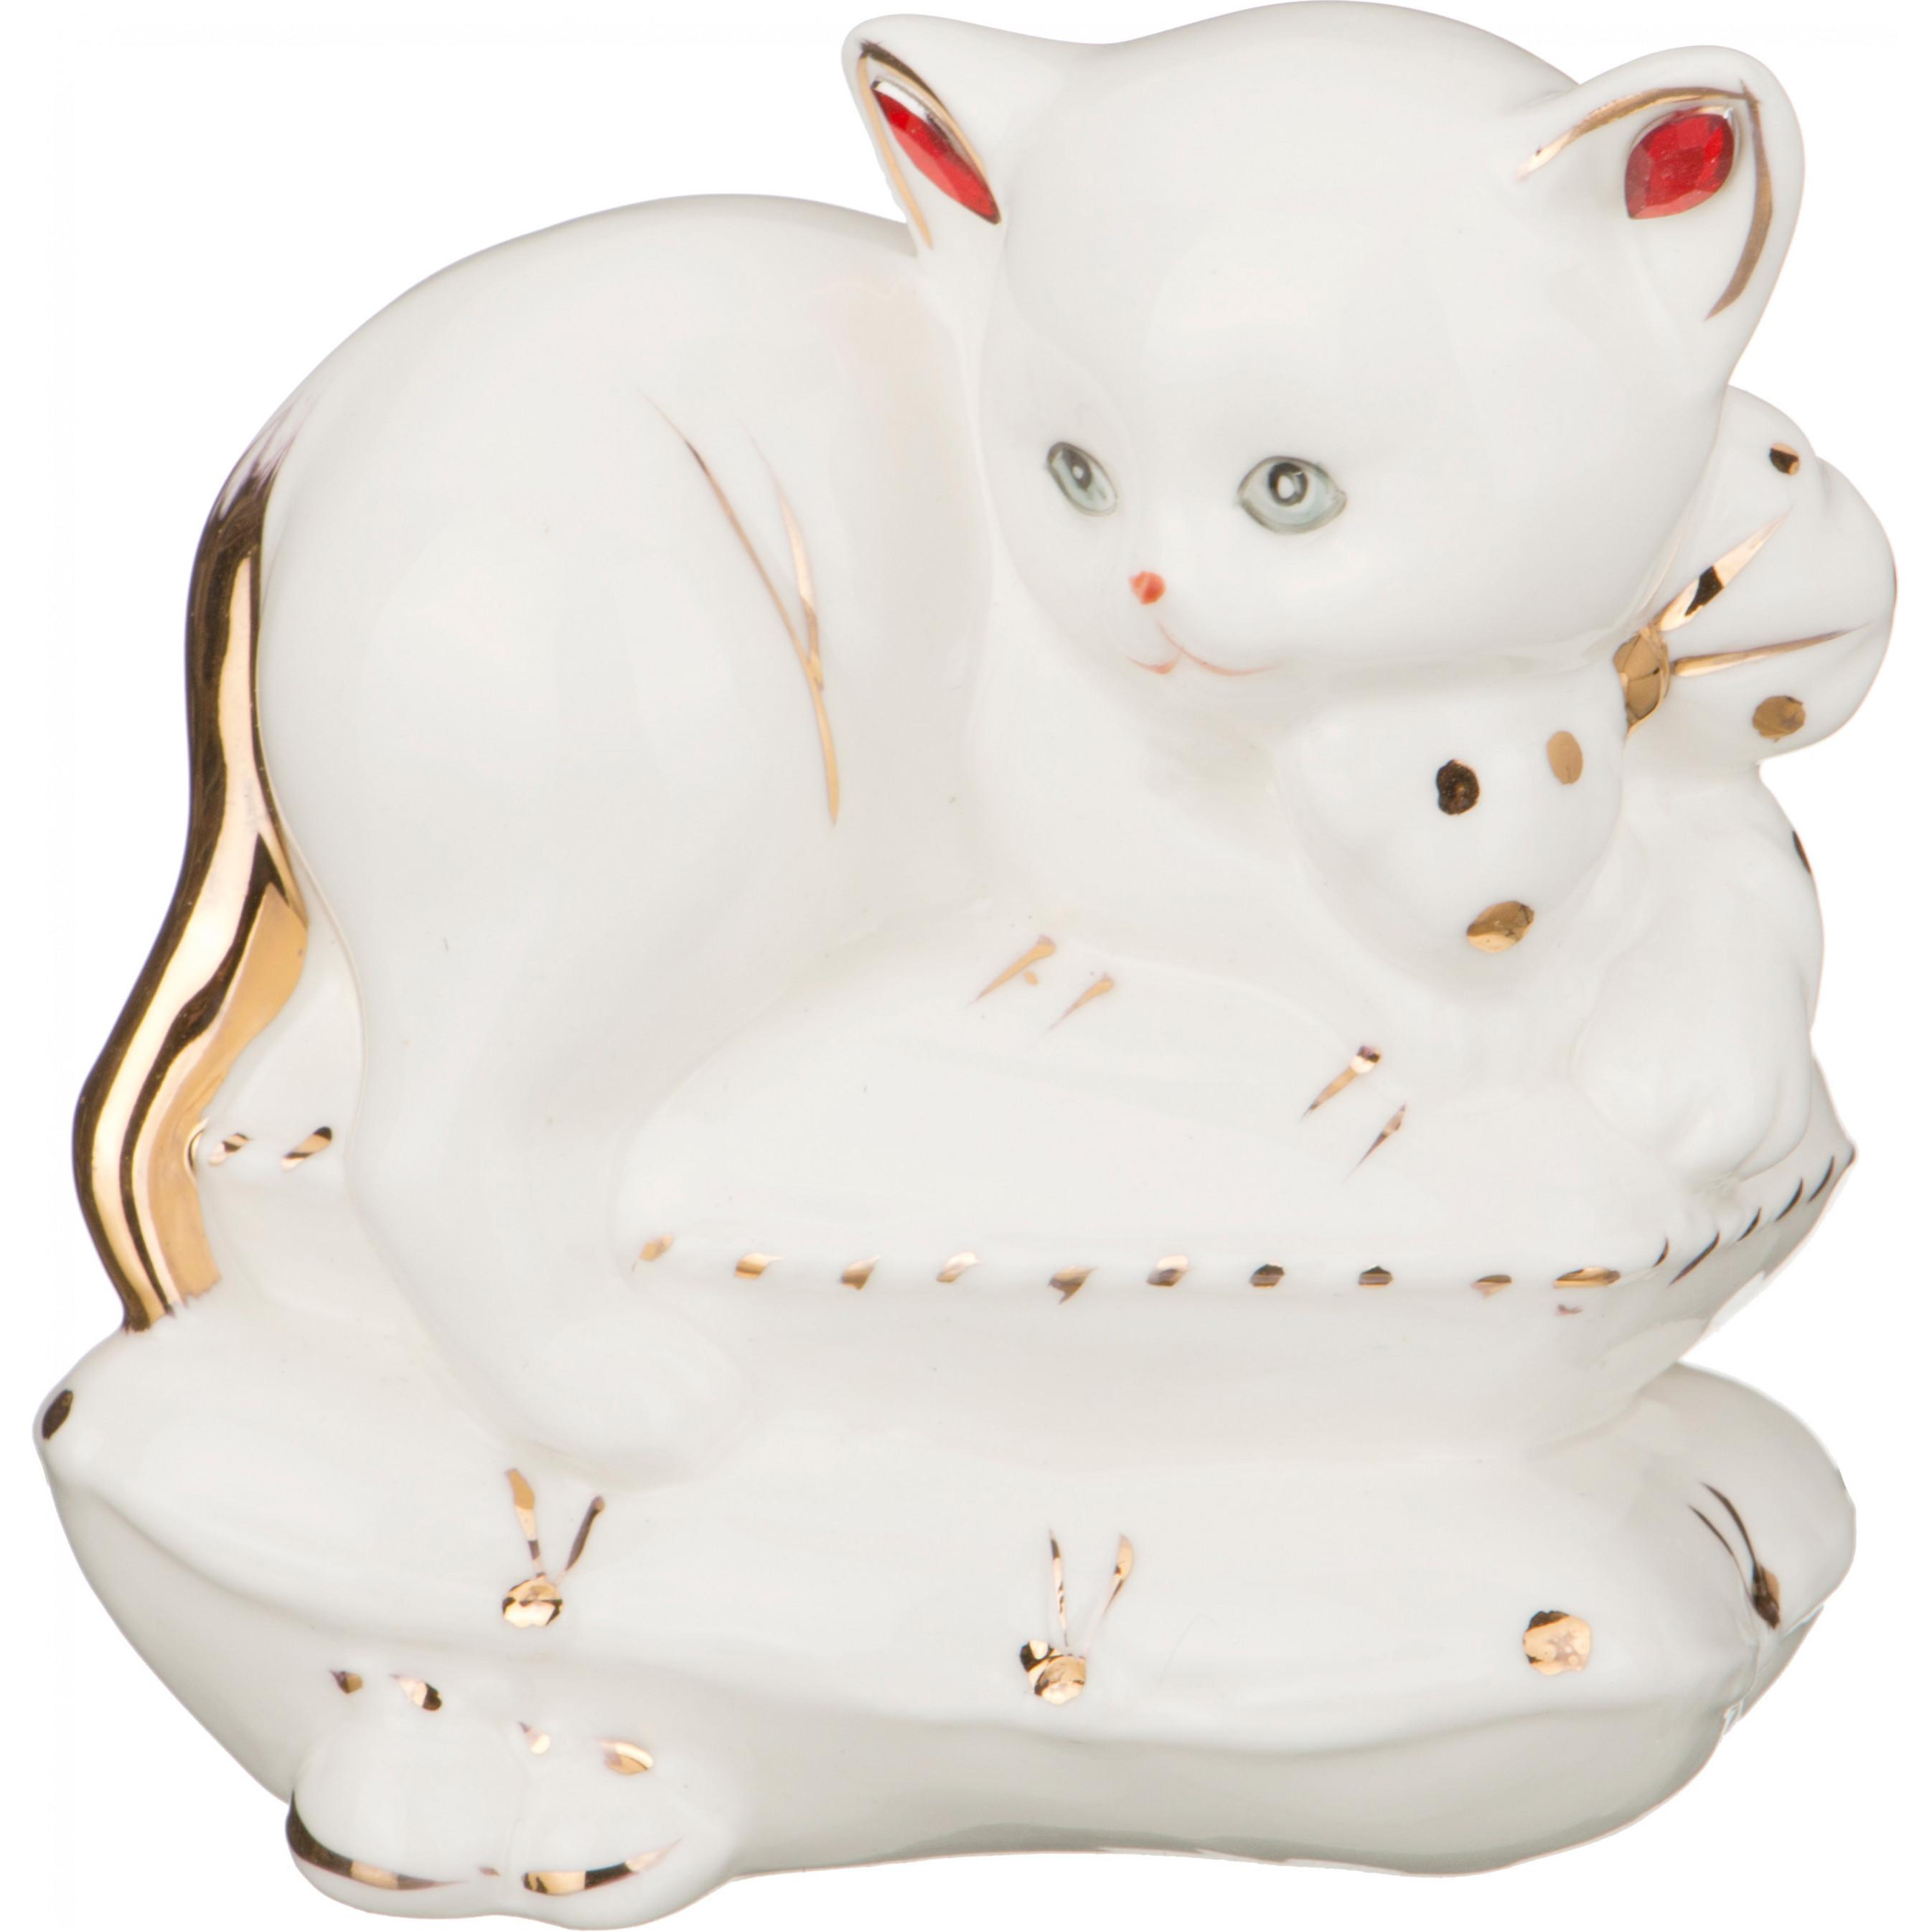 Купить Статуэтки и фигурки Lefard, Фигурка Кошка (7х9х10 см), Китай, Белый, Фарфор